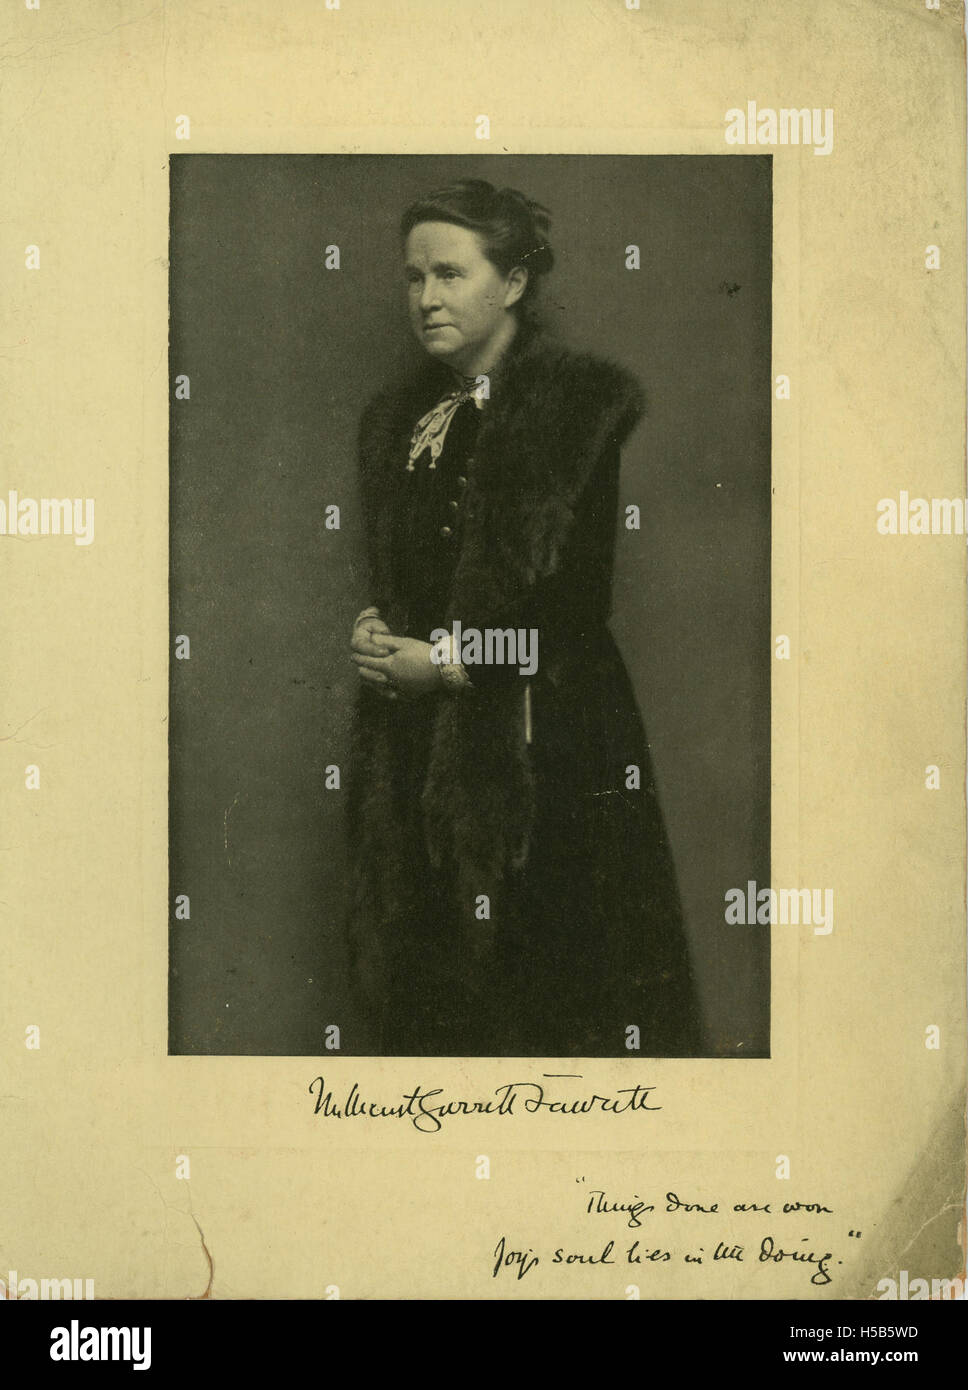 Millicent Garrett Fawcett - Stock Image